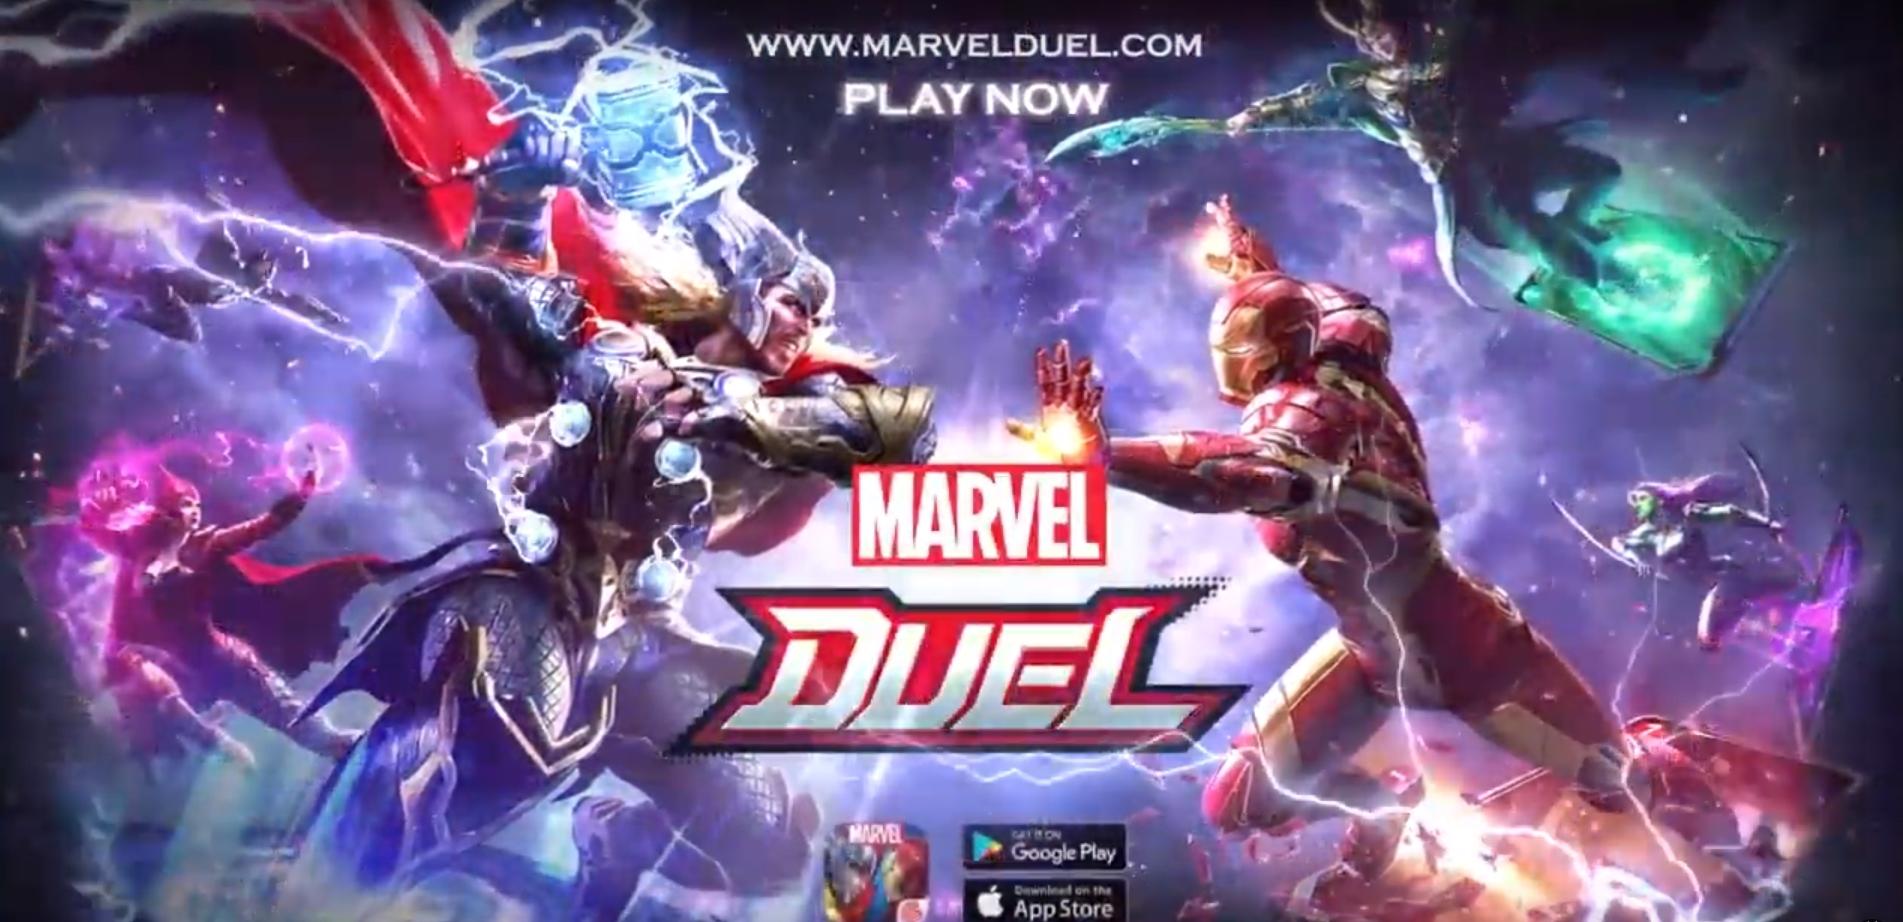 MARVEL Duel PC